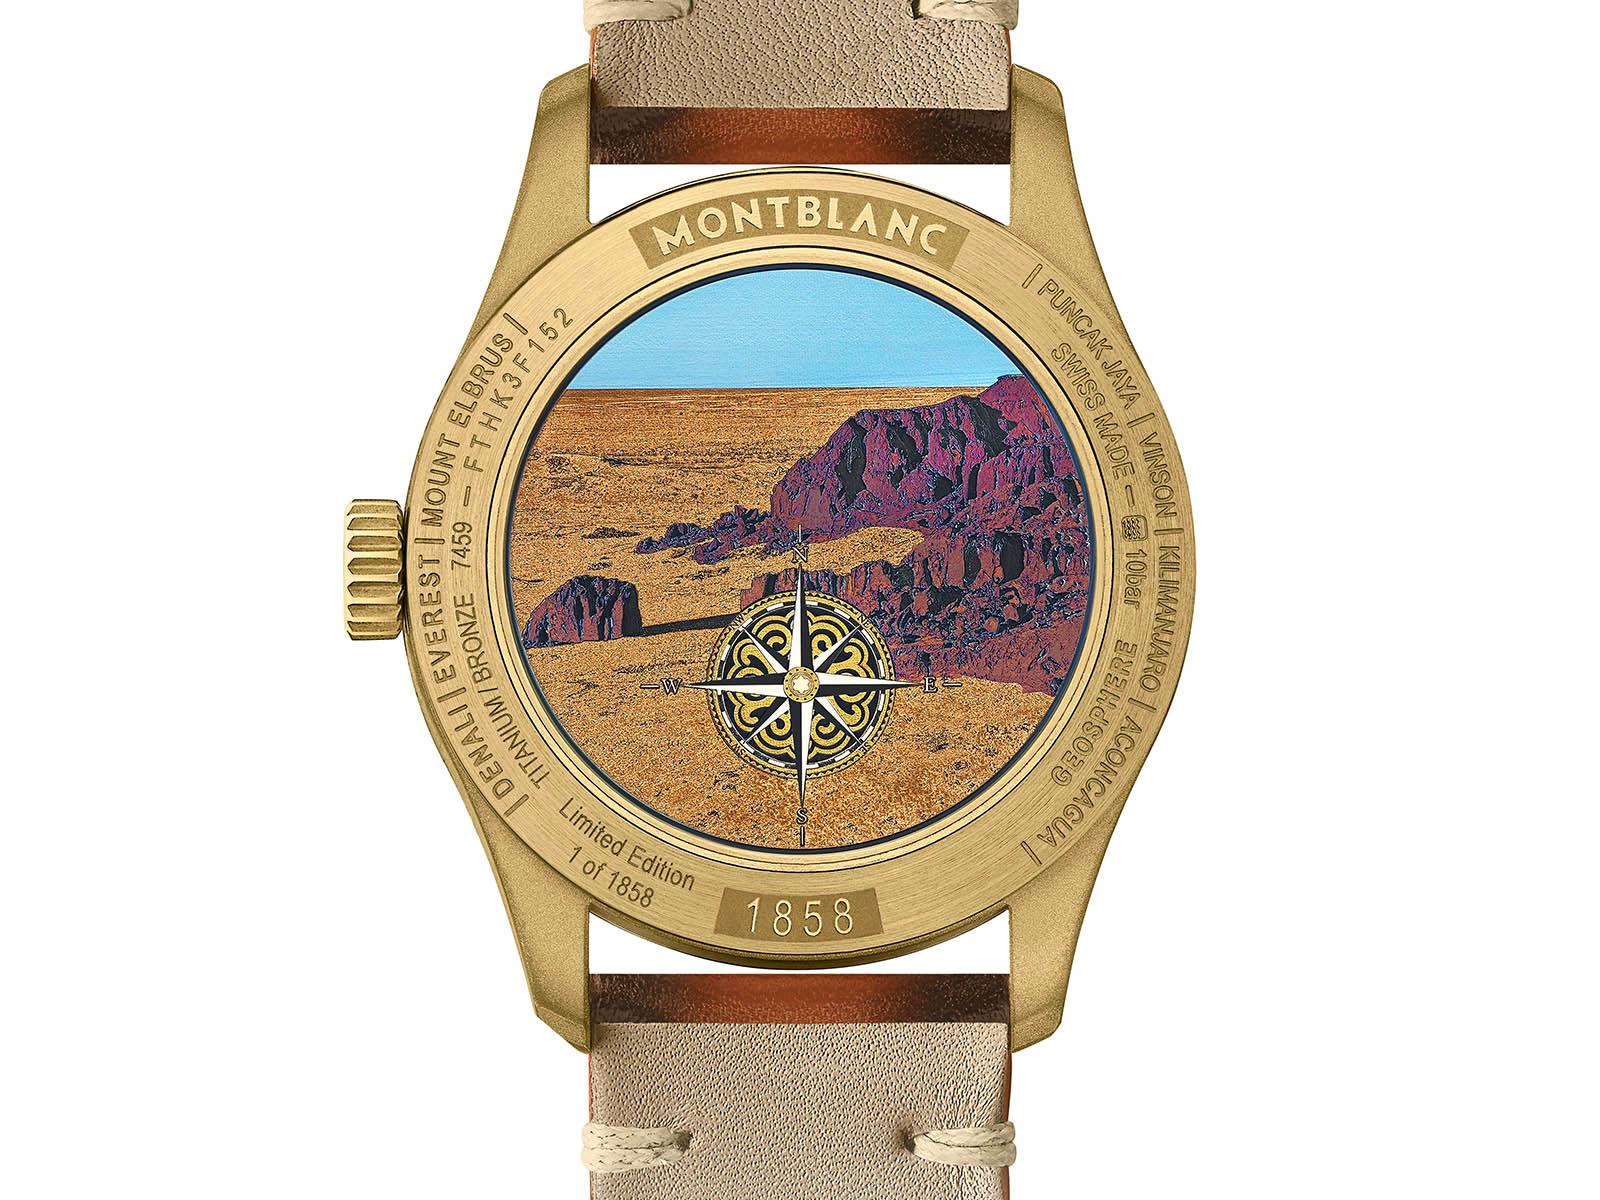 128504-montblanc-1858-geosphere-limited-edition-1858-7.jpg